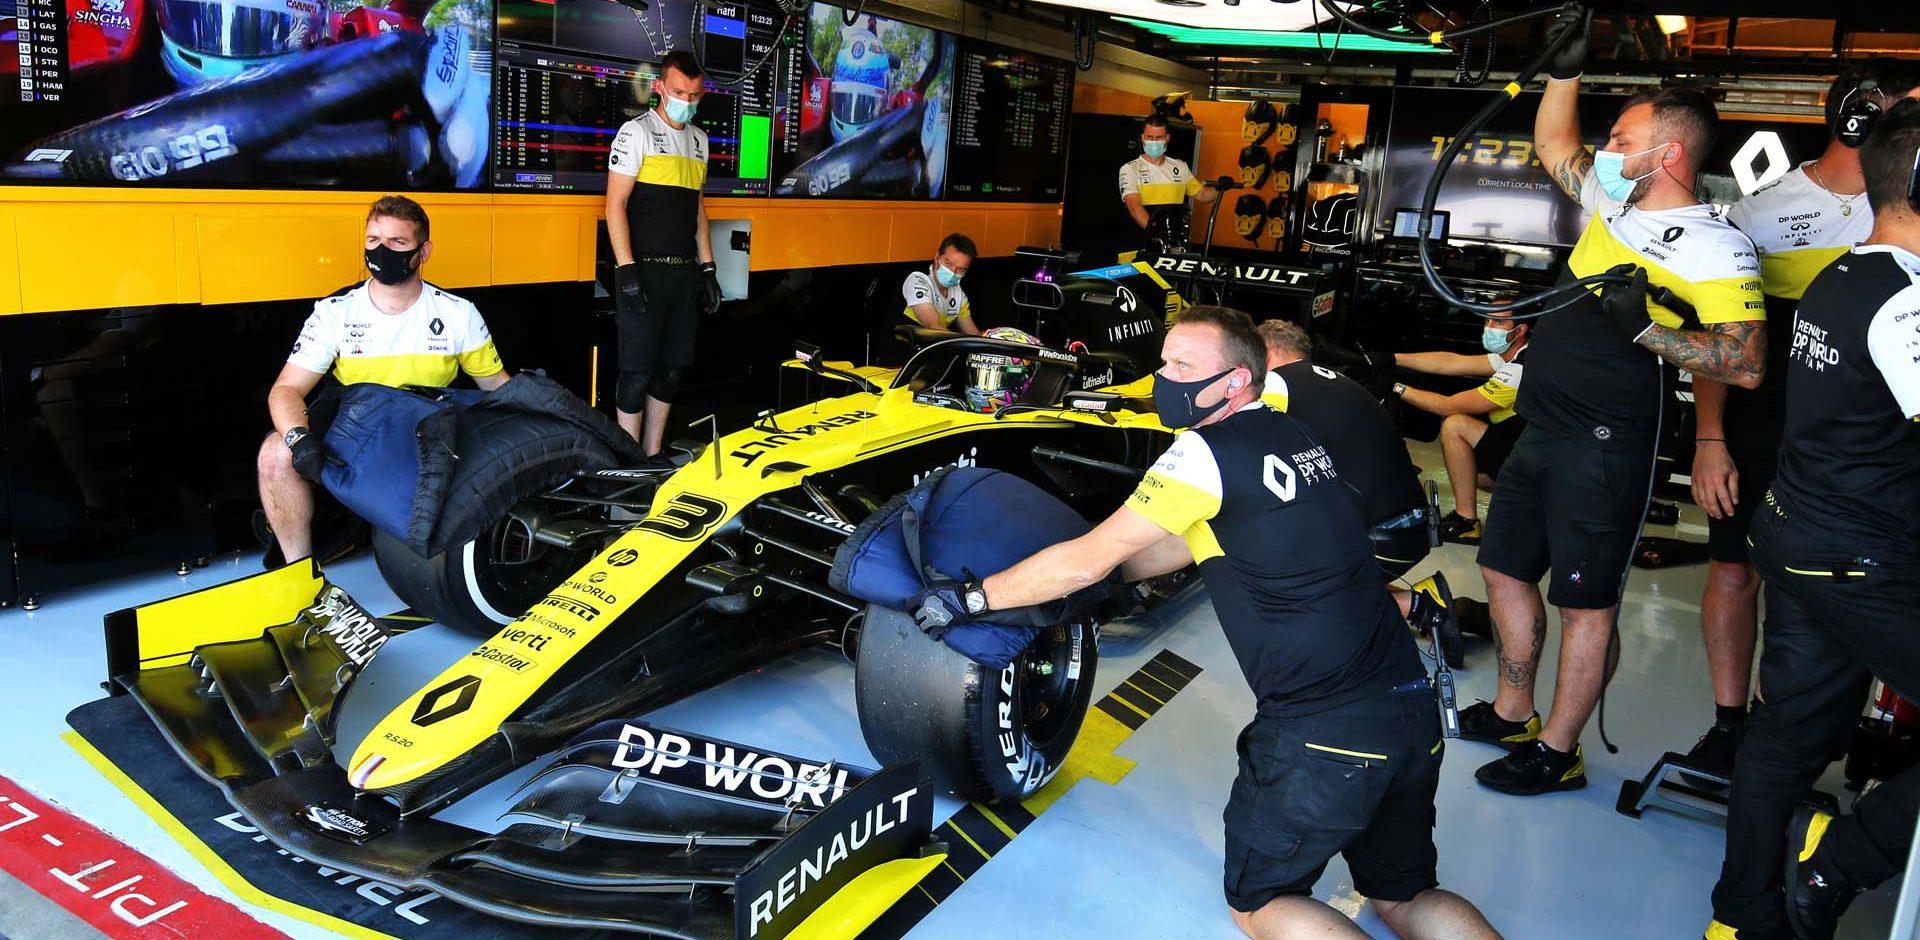 Daniel Ricciardo (AUS) Renault F1 Team RS20. Italian Grand Prix, Friday 4th September 2020. Monza Italy.